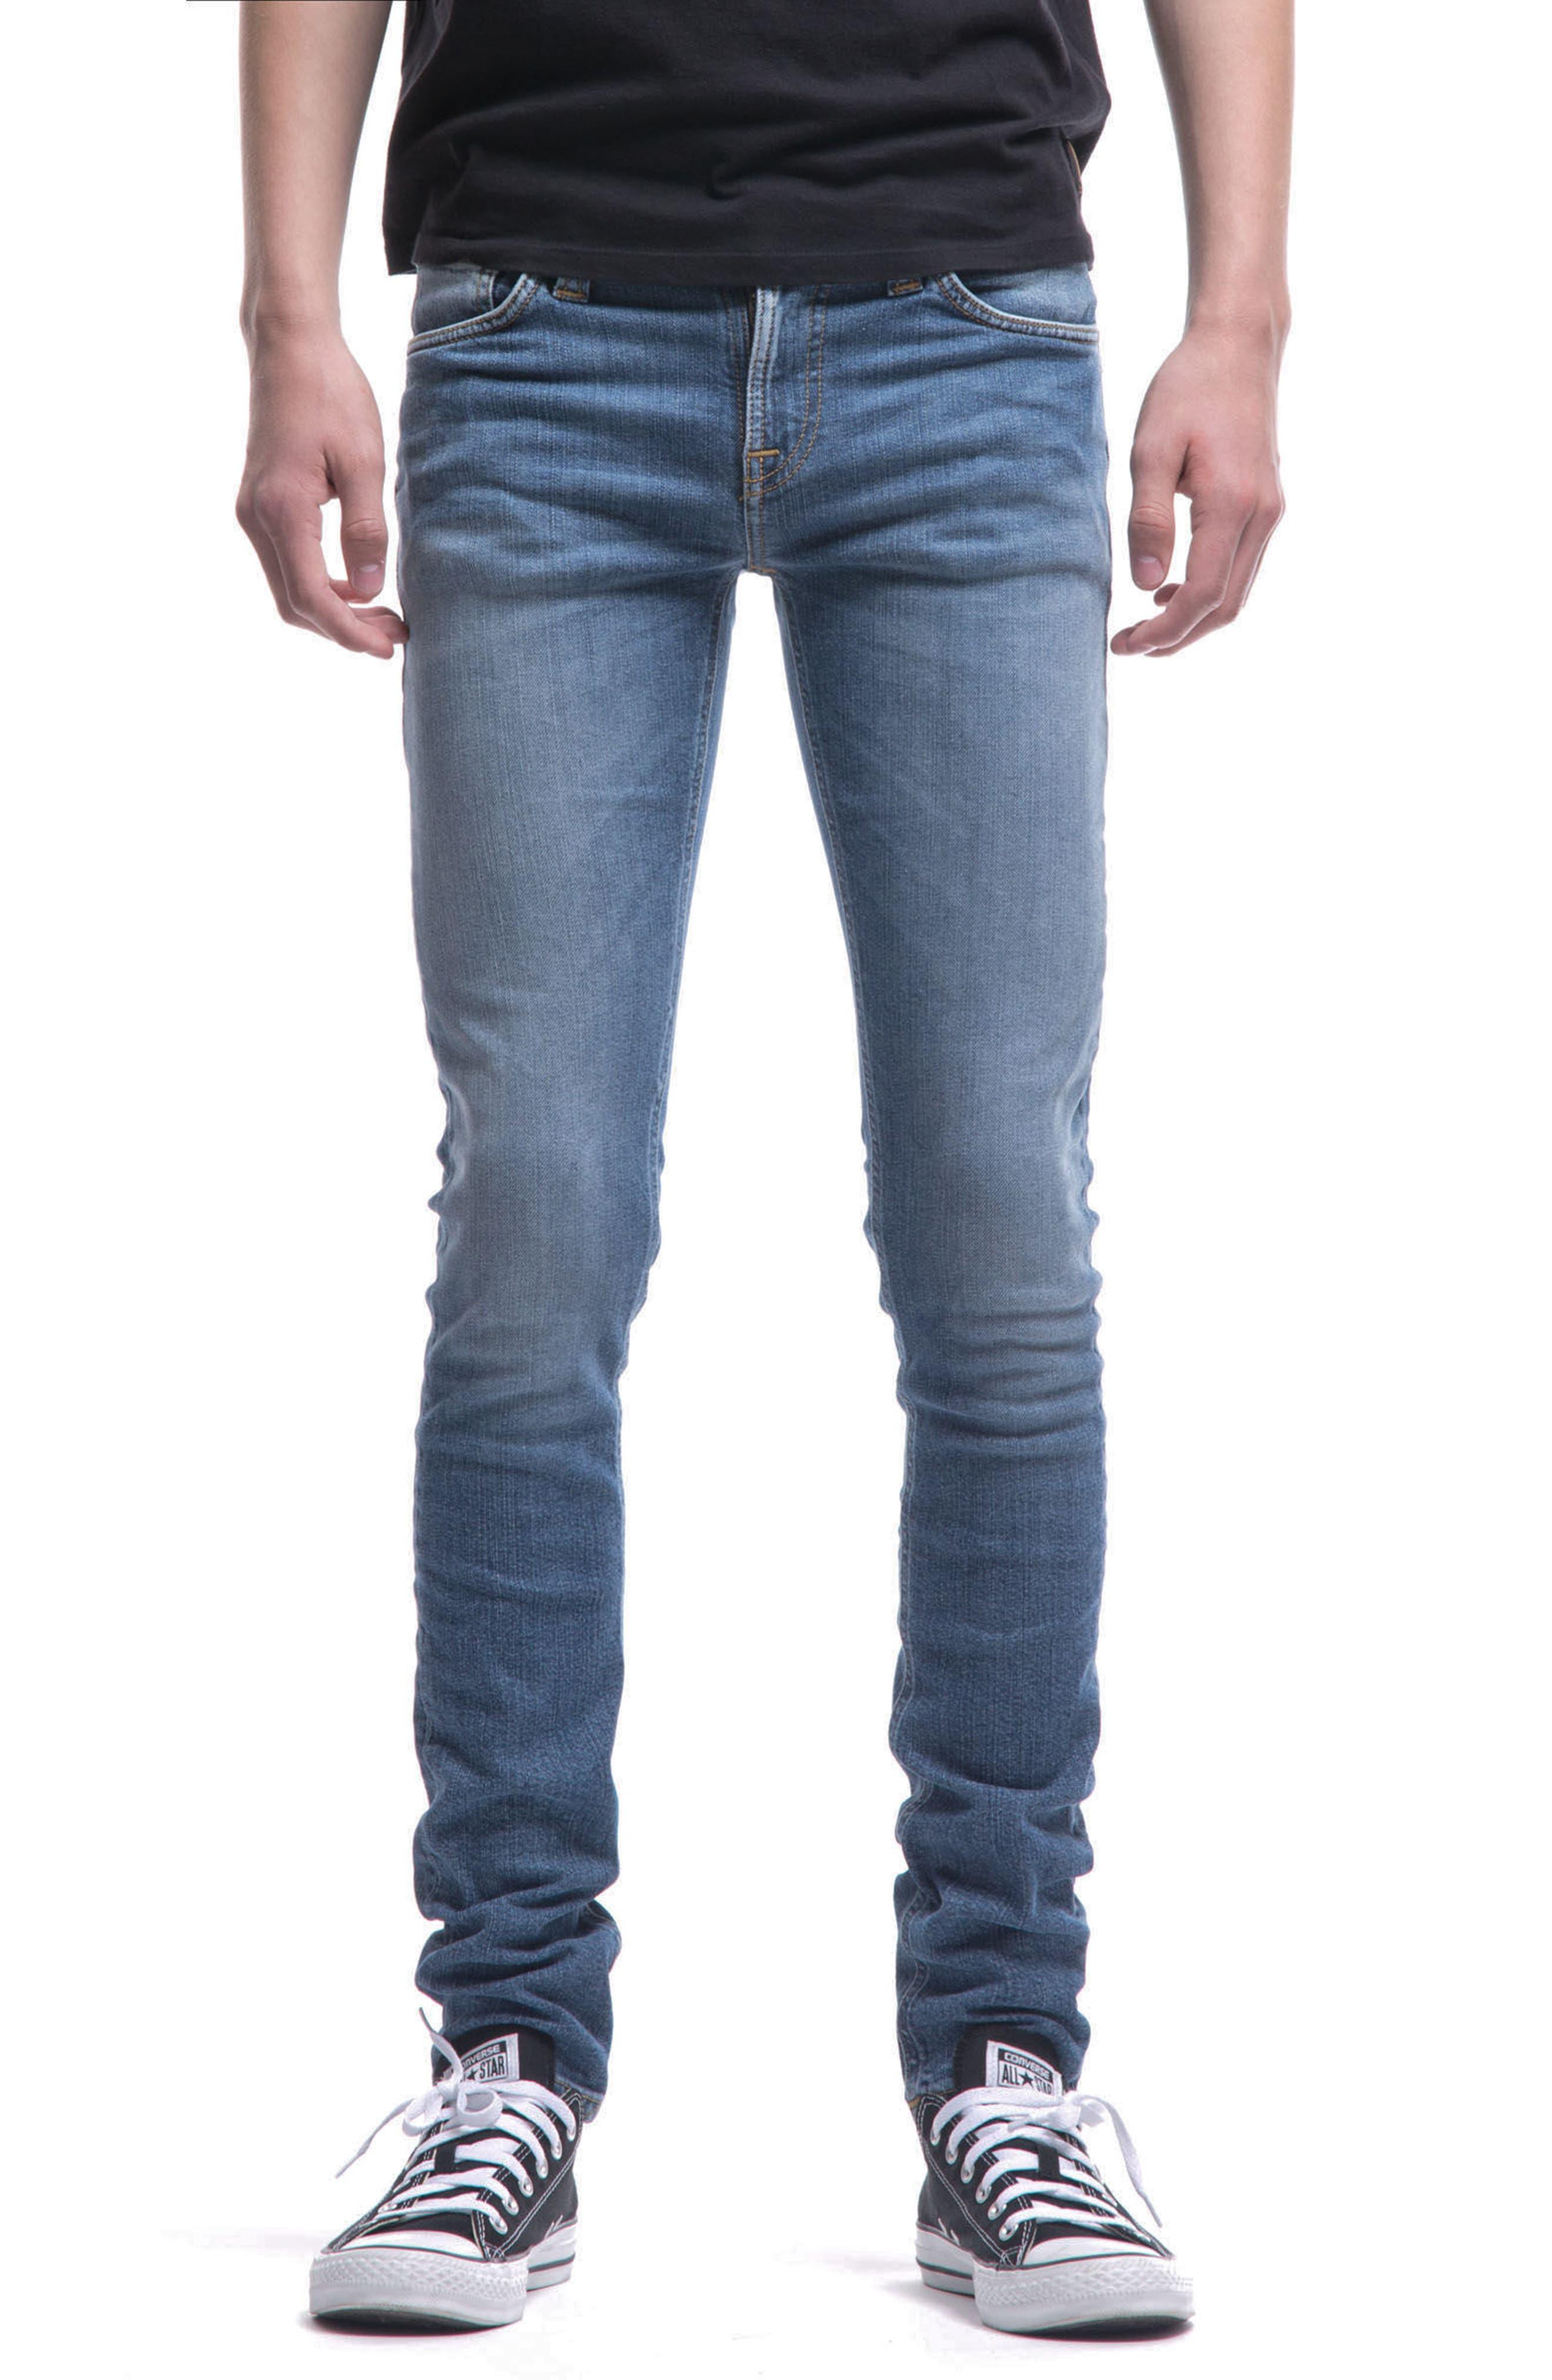 Skinny Lin Skinny Fit Jeans,                             Main thumbnail 1, color,                             460